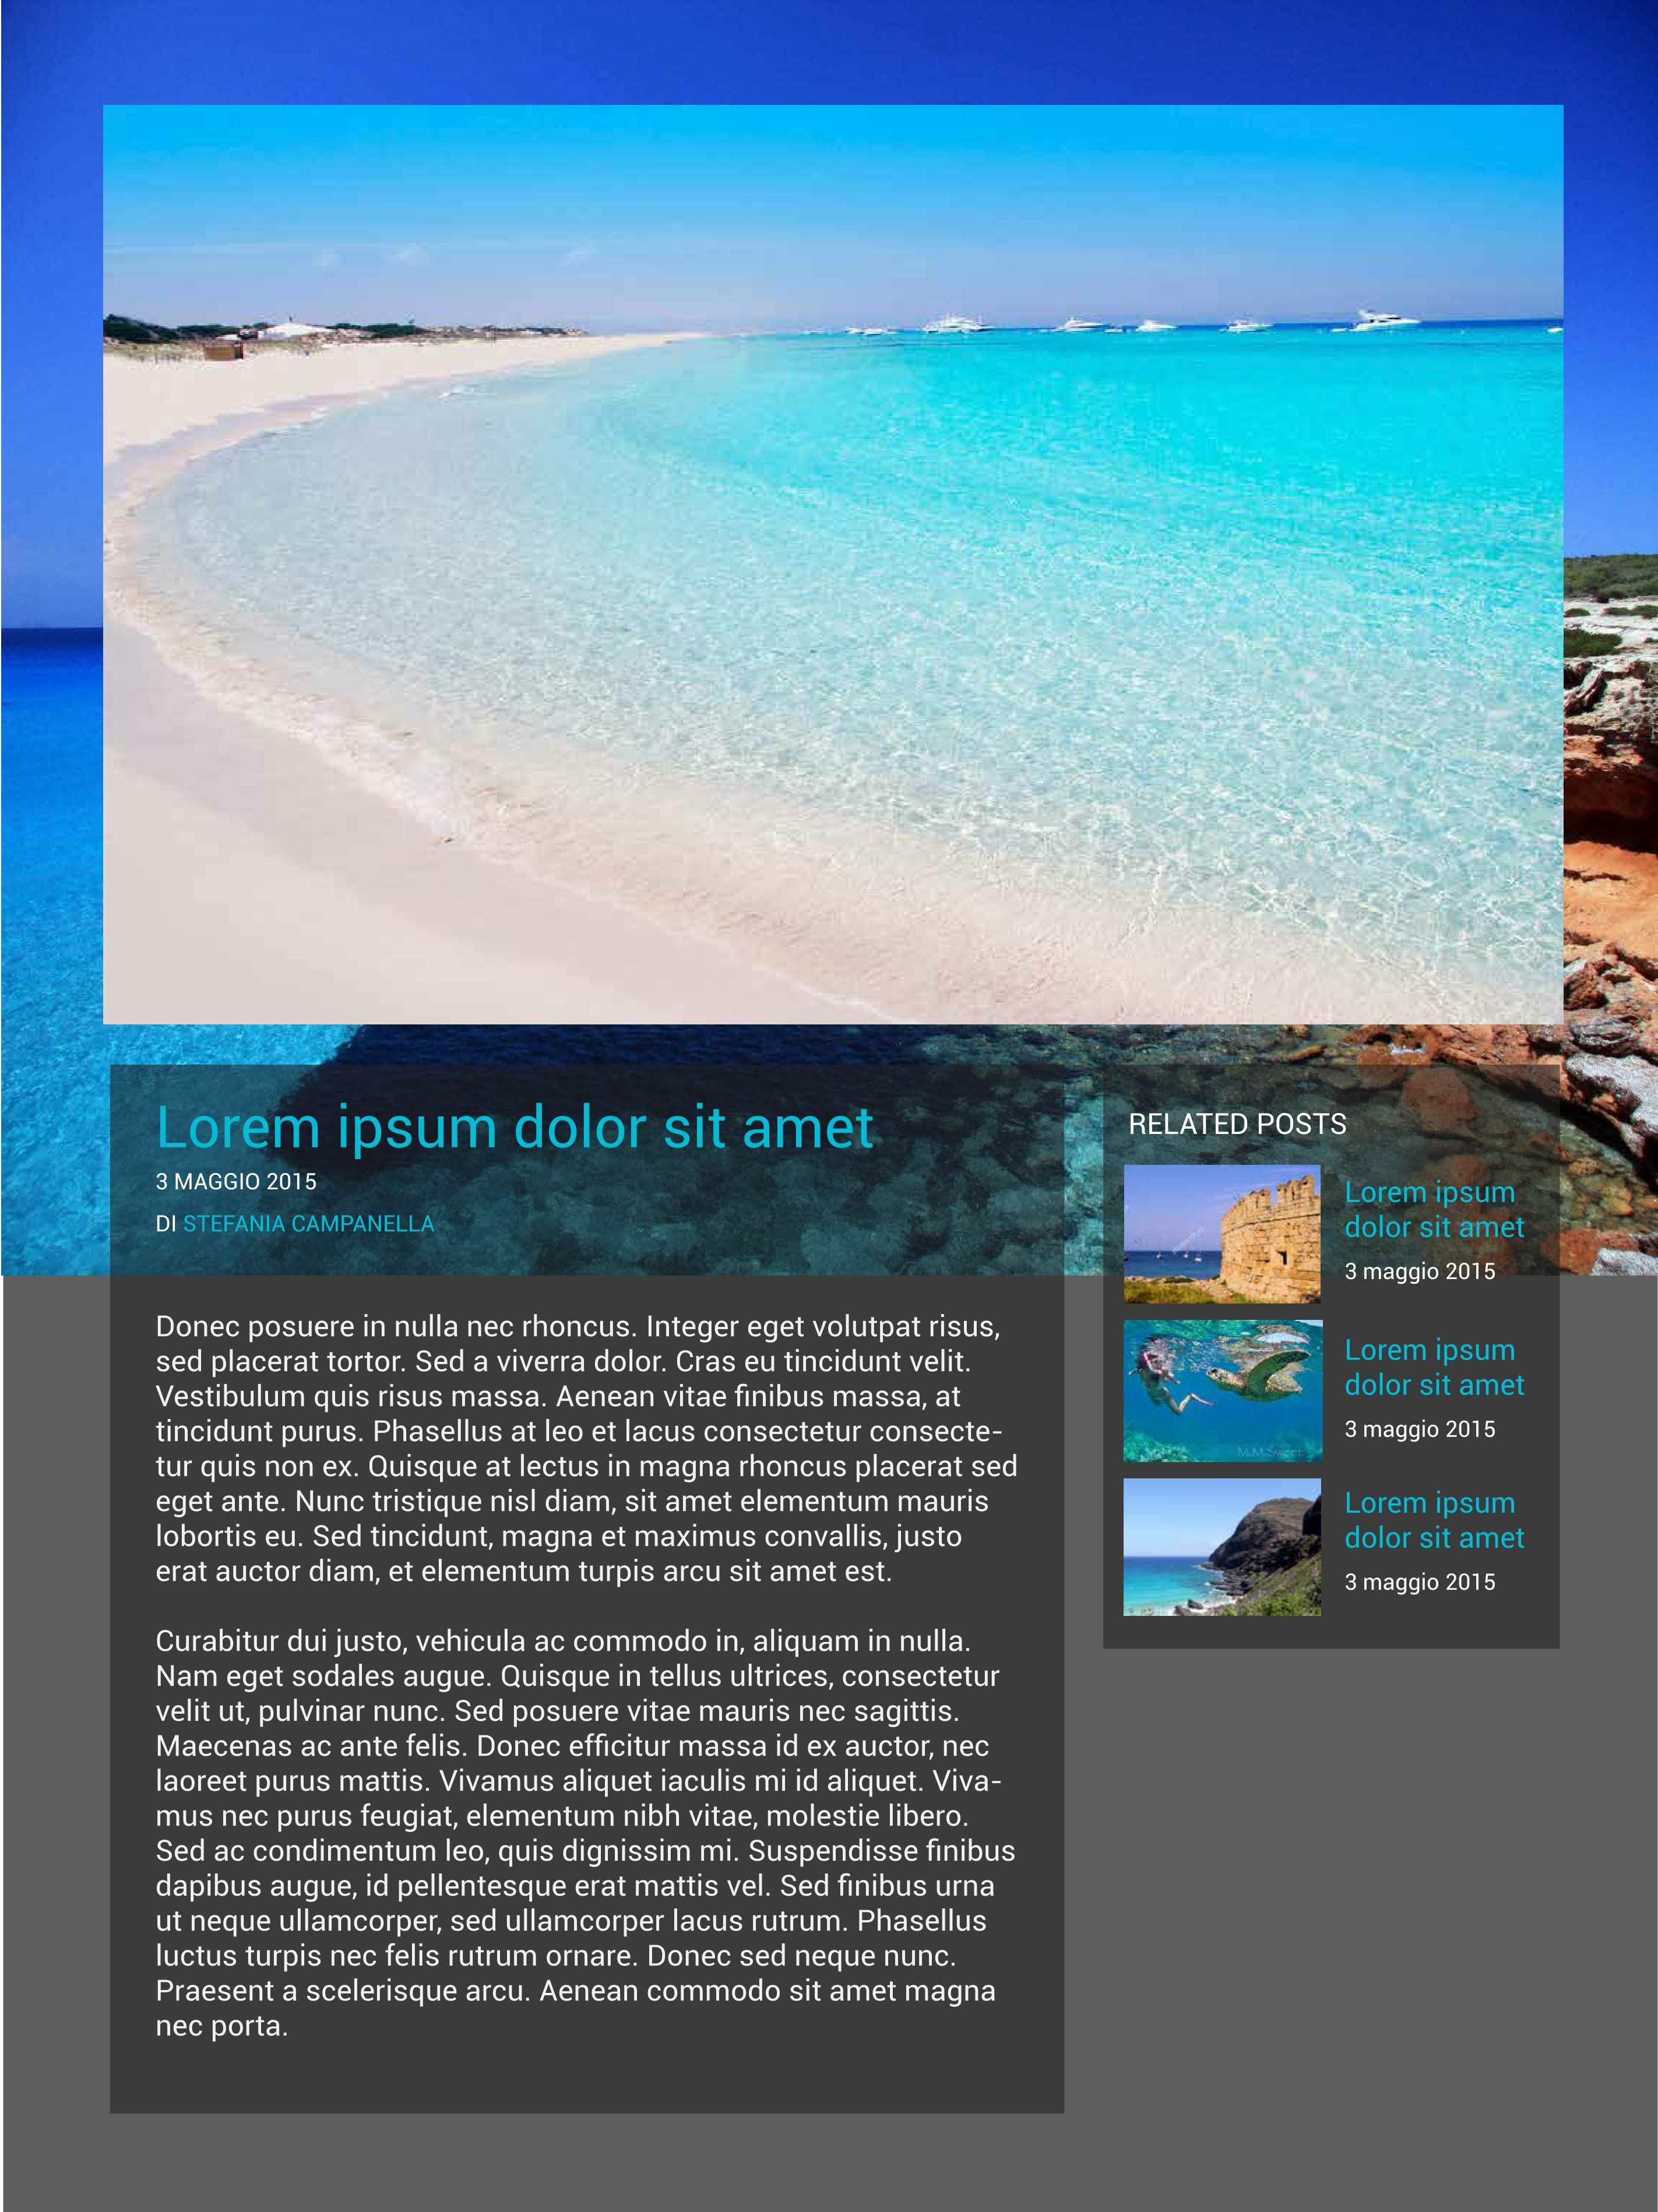 Formentera blog article detail 2